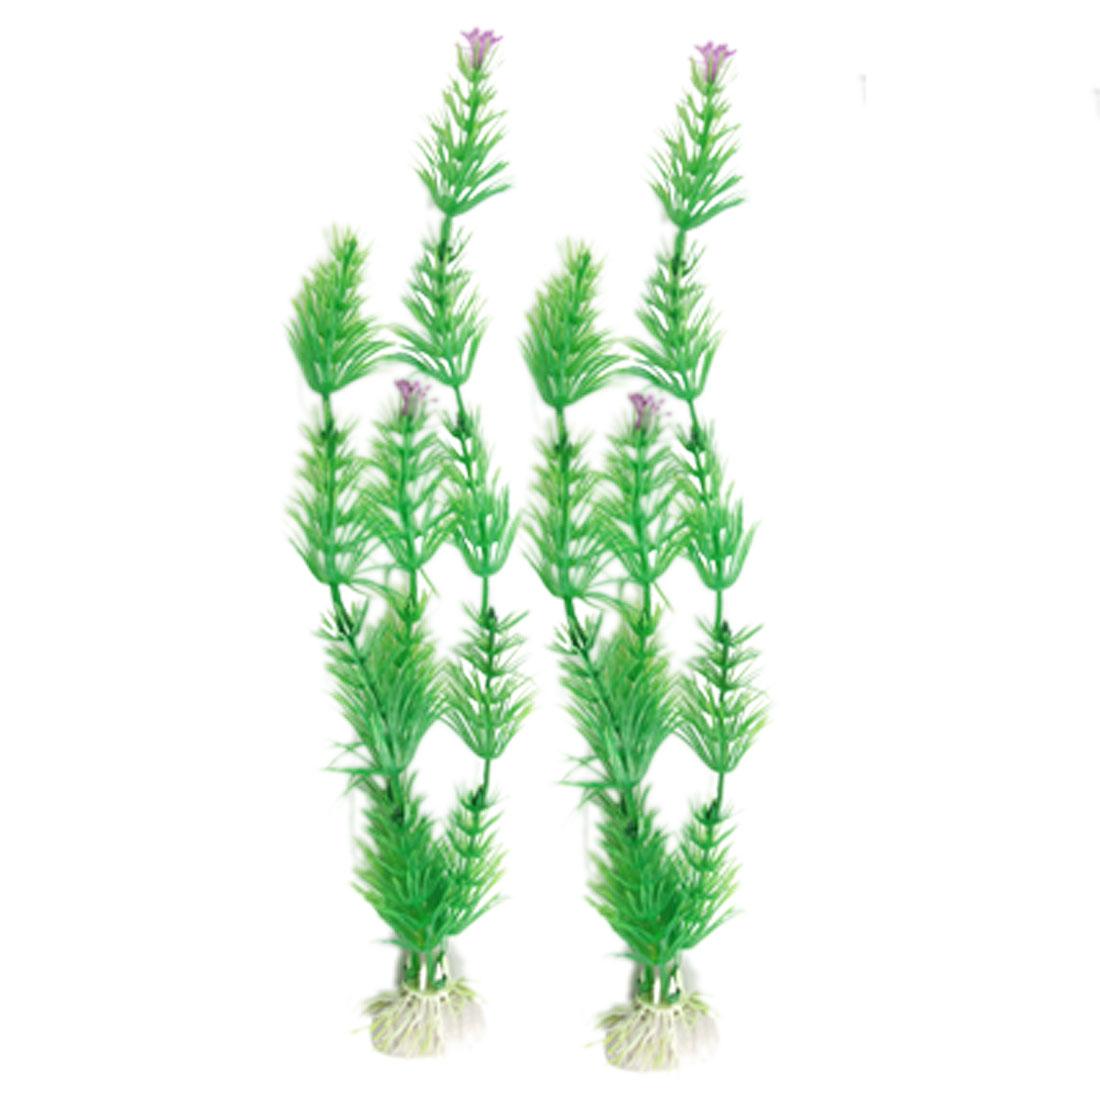 2 Pcs Eusteralis Stellata Shape Green Plastic Plant Aquascaping